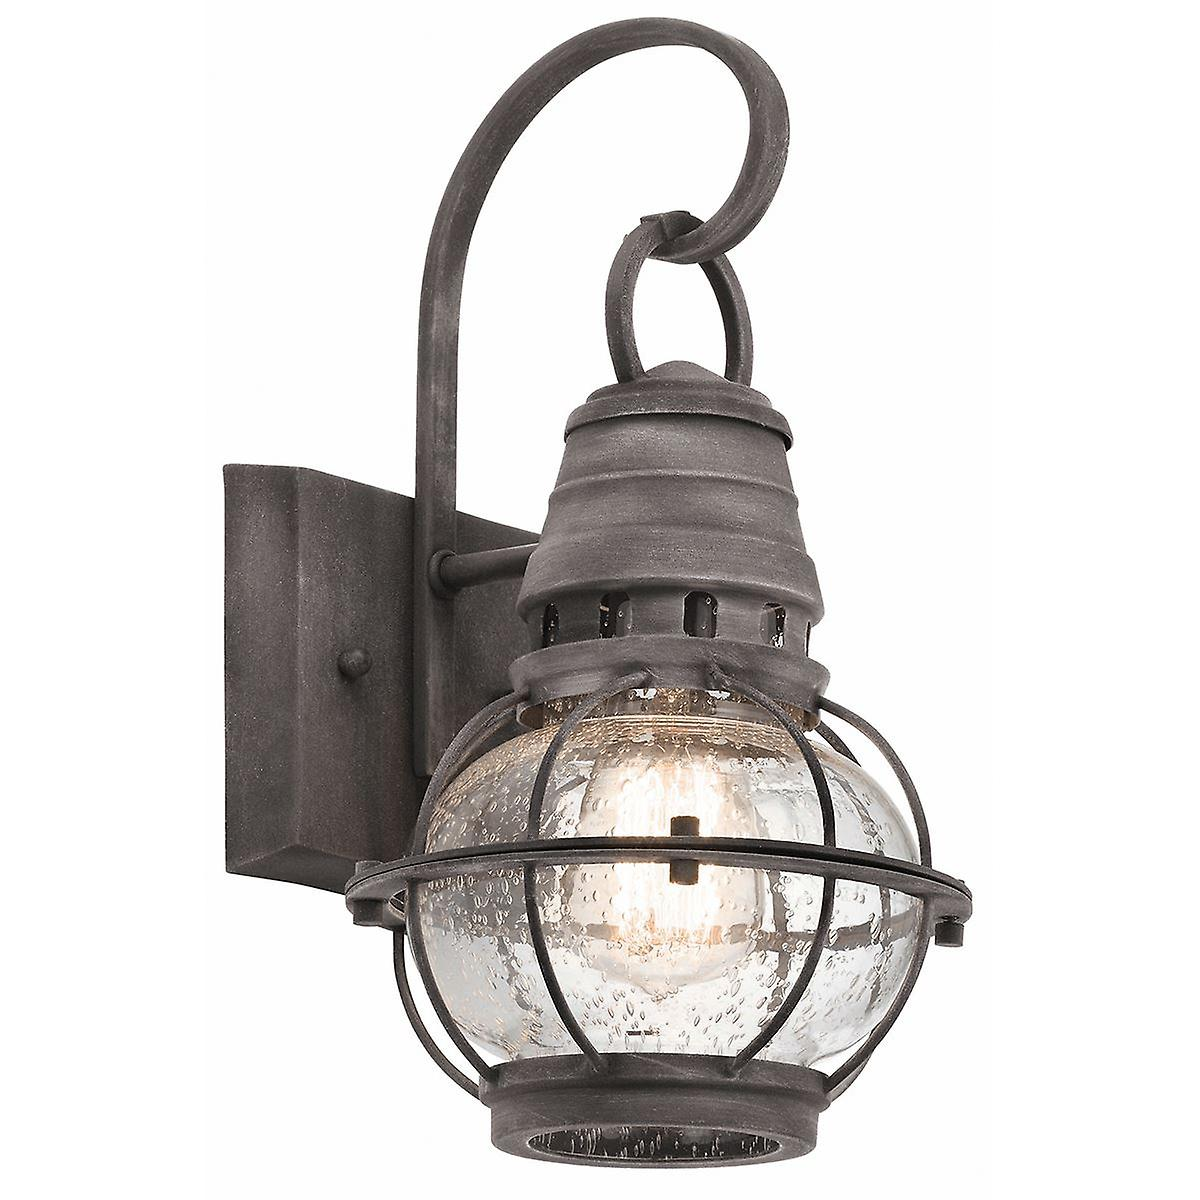 Elstead - 1 Light Small Wall Lantern - Zinc Finish - KL BRIDGEPOINT S